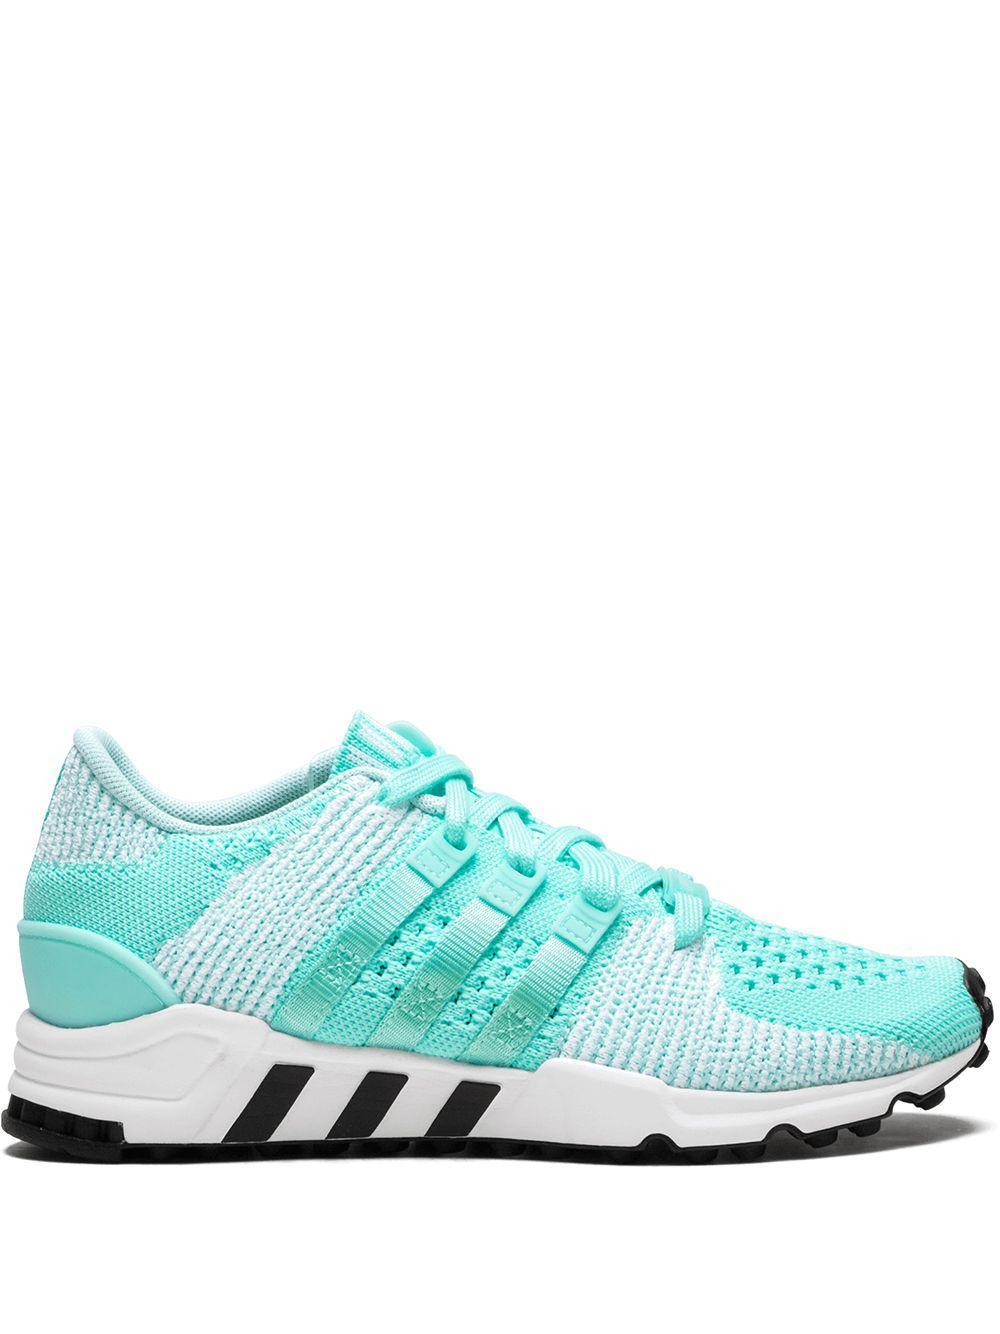 Eqt Support Rf Pk Sneakers